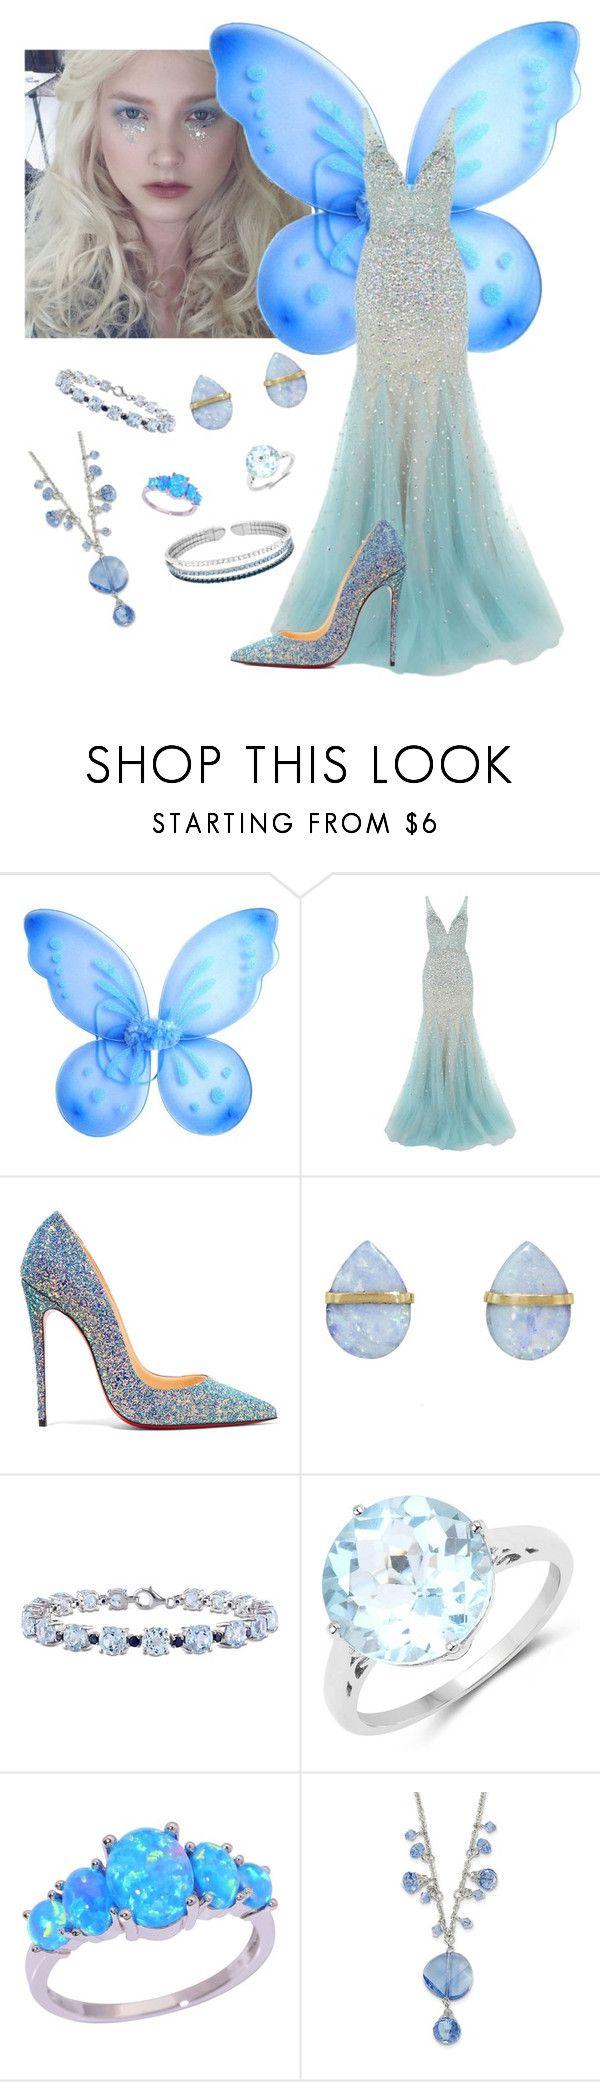 """Adelaide's Halloween Costume: Blue Fairy"" by raspberry-stegosaurus ❤ liked on Polyvore featuring Jovani, Christian Louboutin, Melissa Joy Manning, Miadora, Olivia Leone and 1928"